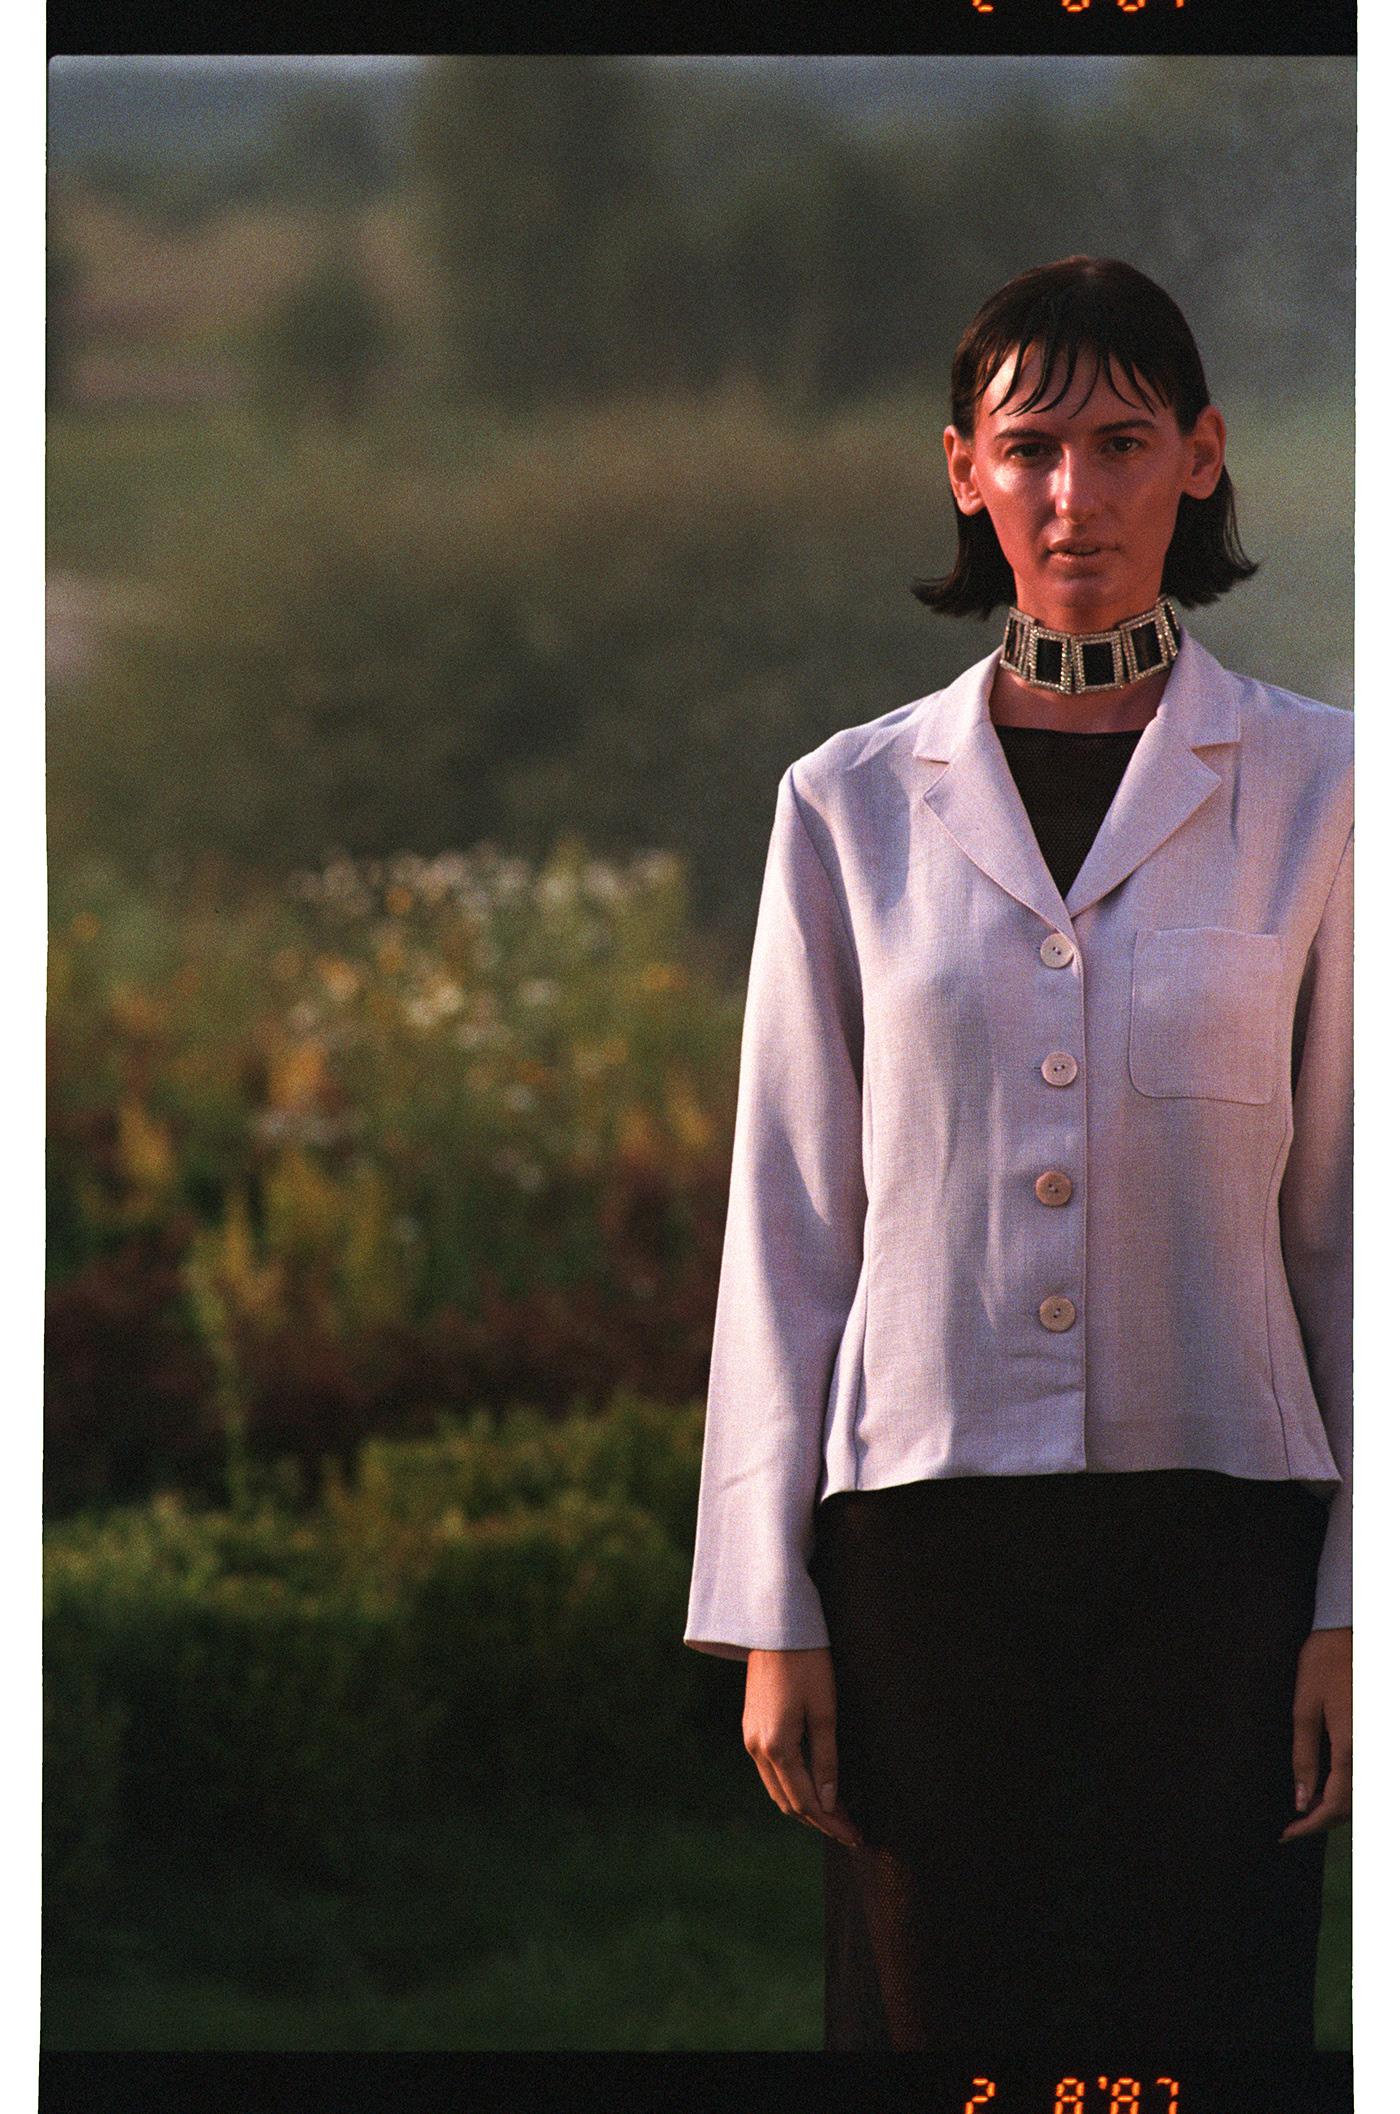 Image may contain: person, shirt and coat